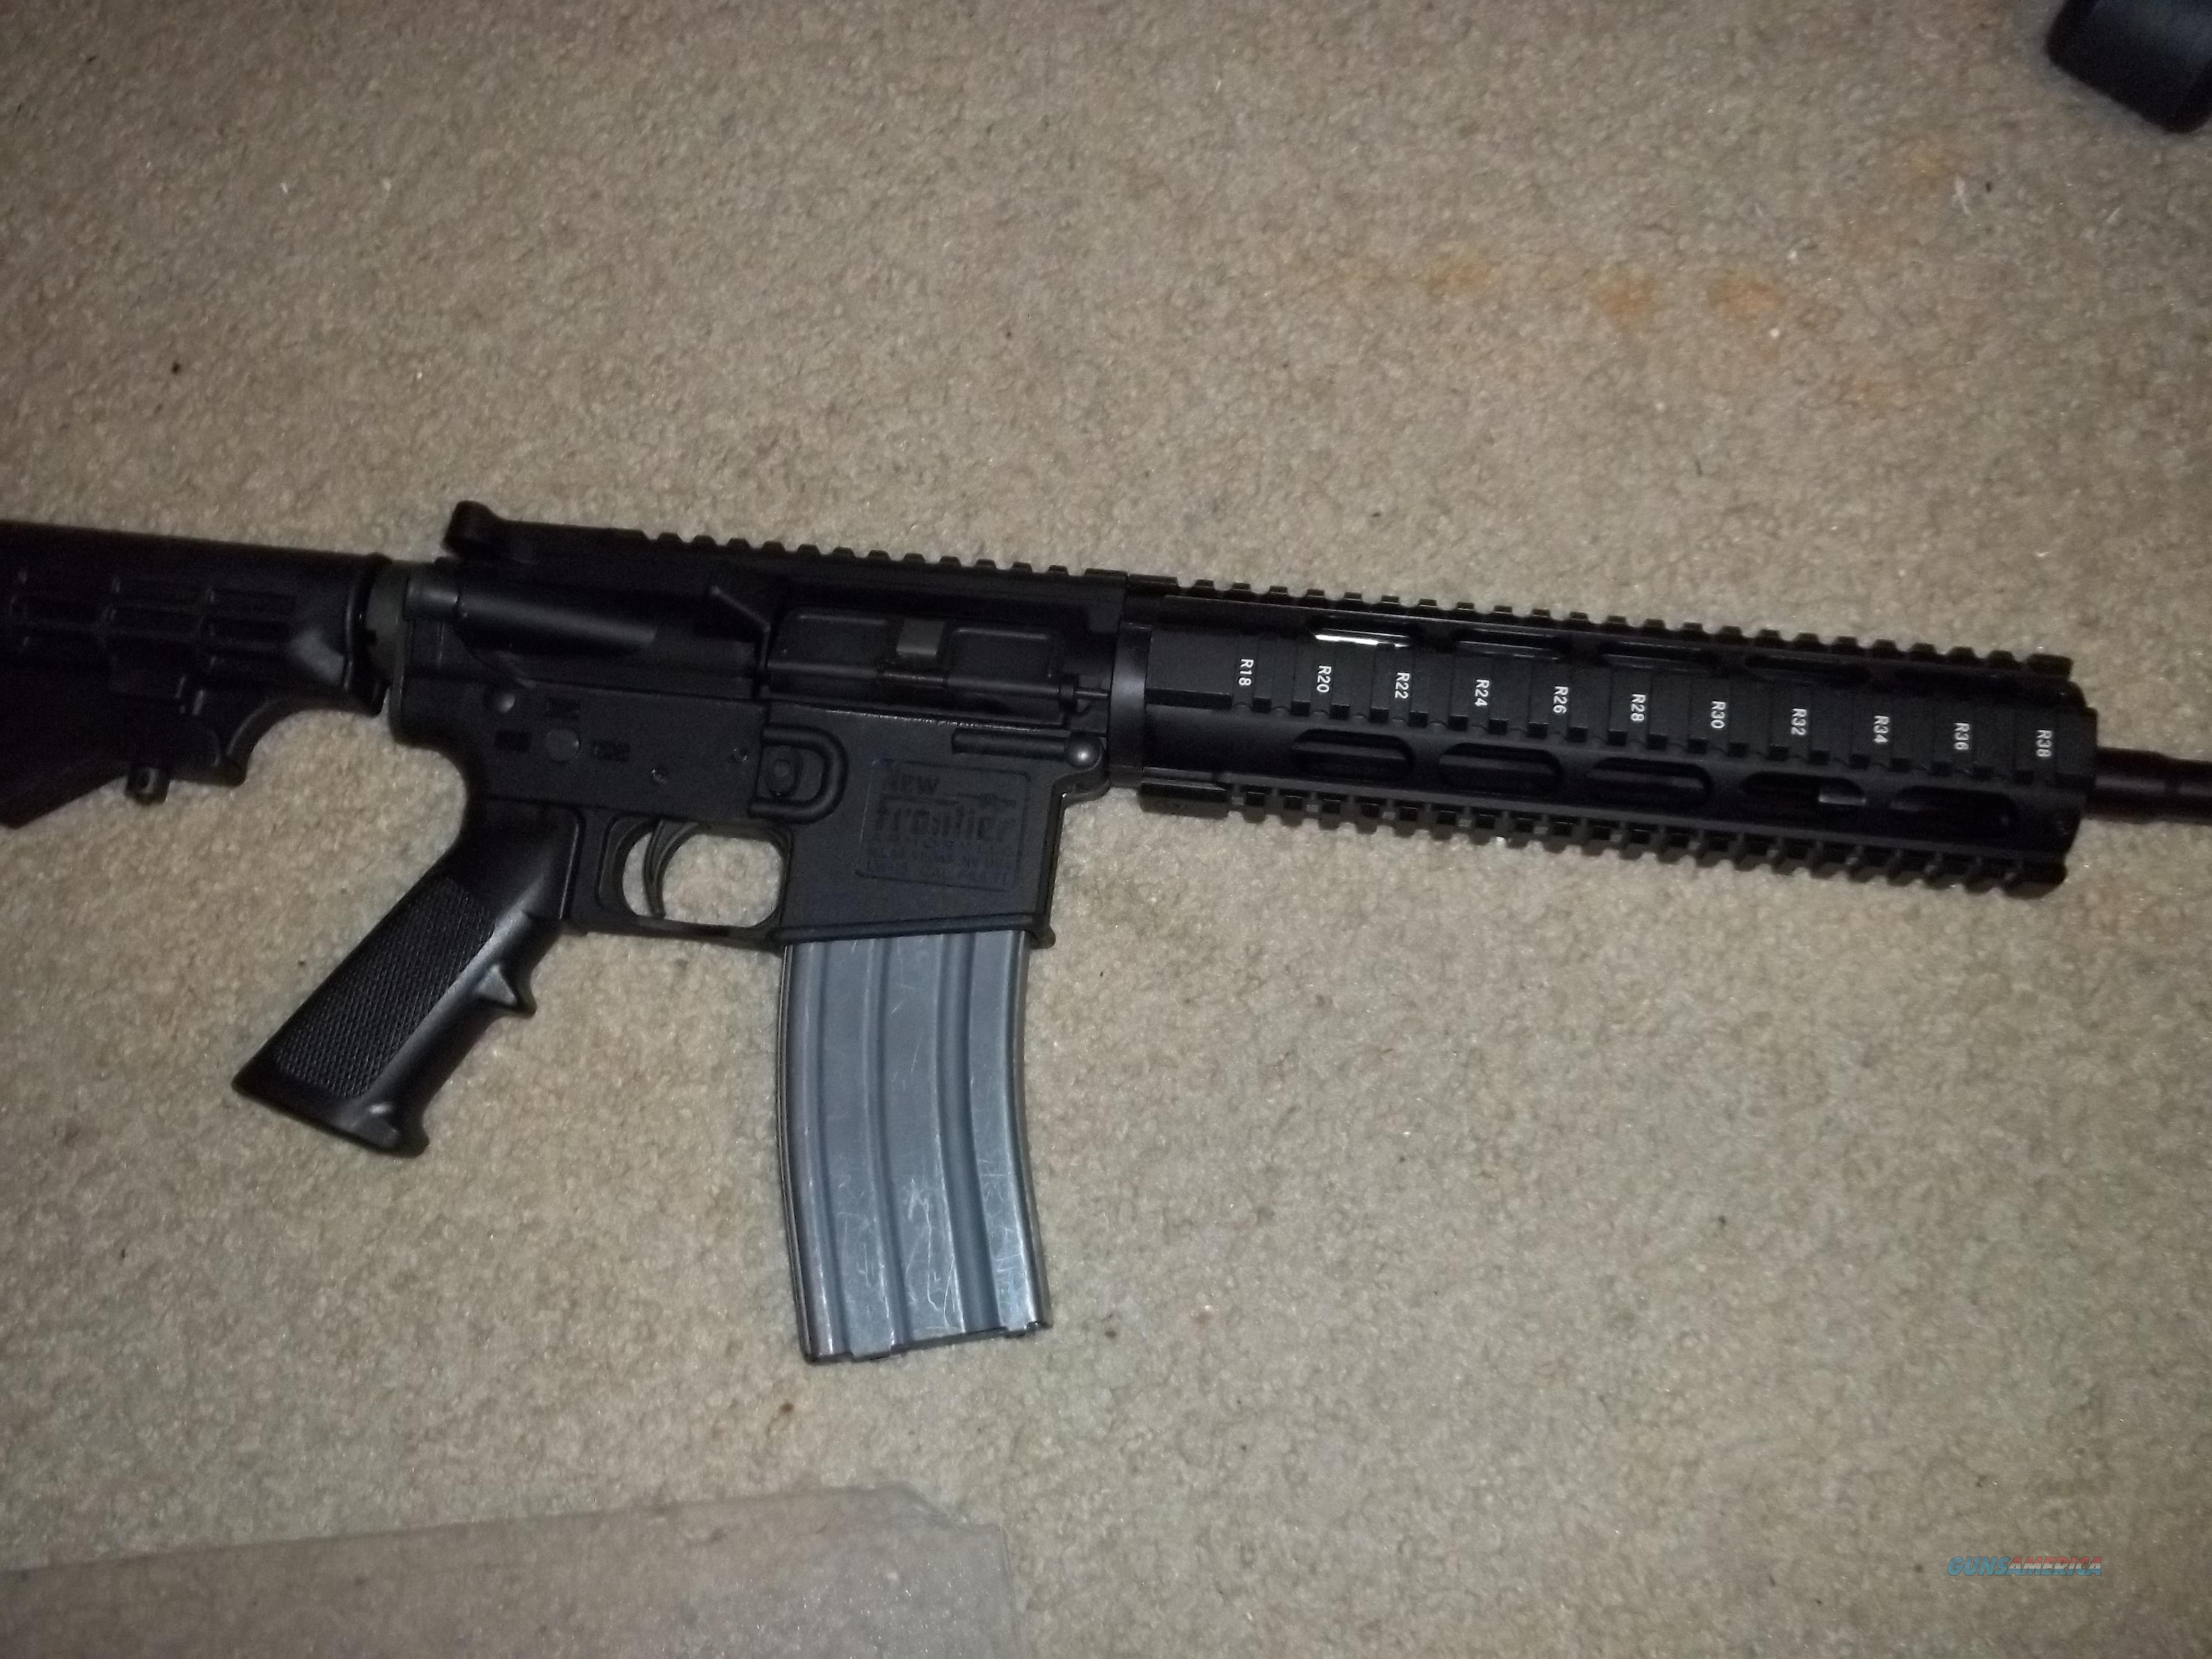 Hardened Arms AR 15 Quad Rail 556 Nato Guns Rifles